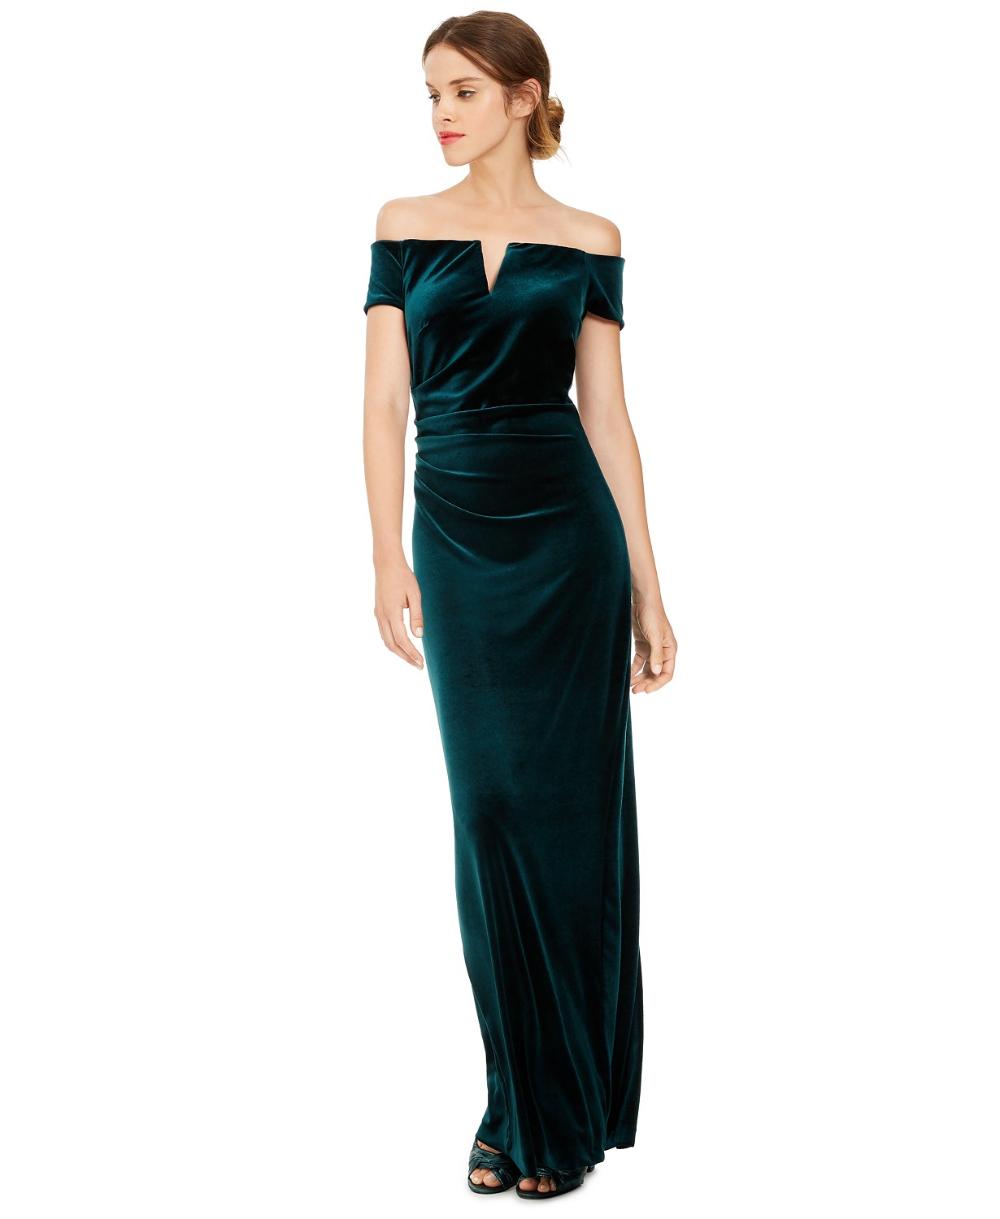 Xscape Velvet Off The Shoulder Gown Reviews Dresses Women Macy S Velvet Bridesmaid Dresses Review Dresses Womens Dresses [ 1219 x 1000 Pixel ]